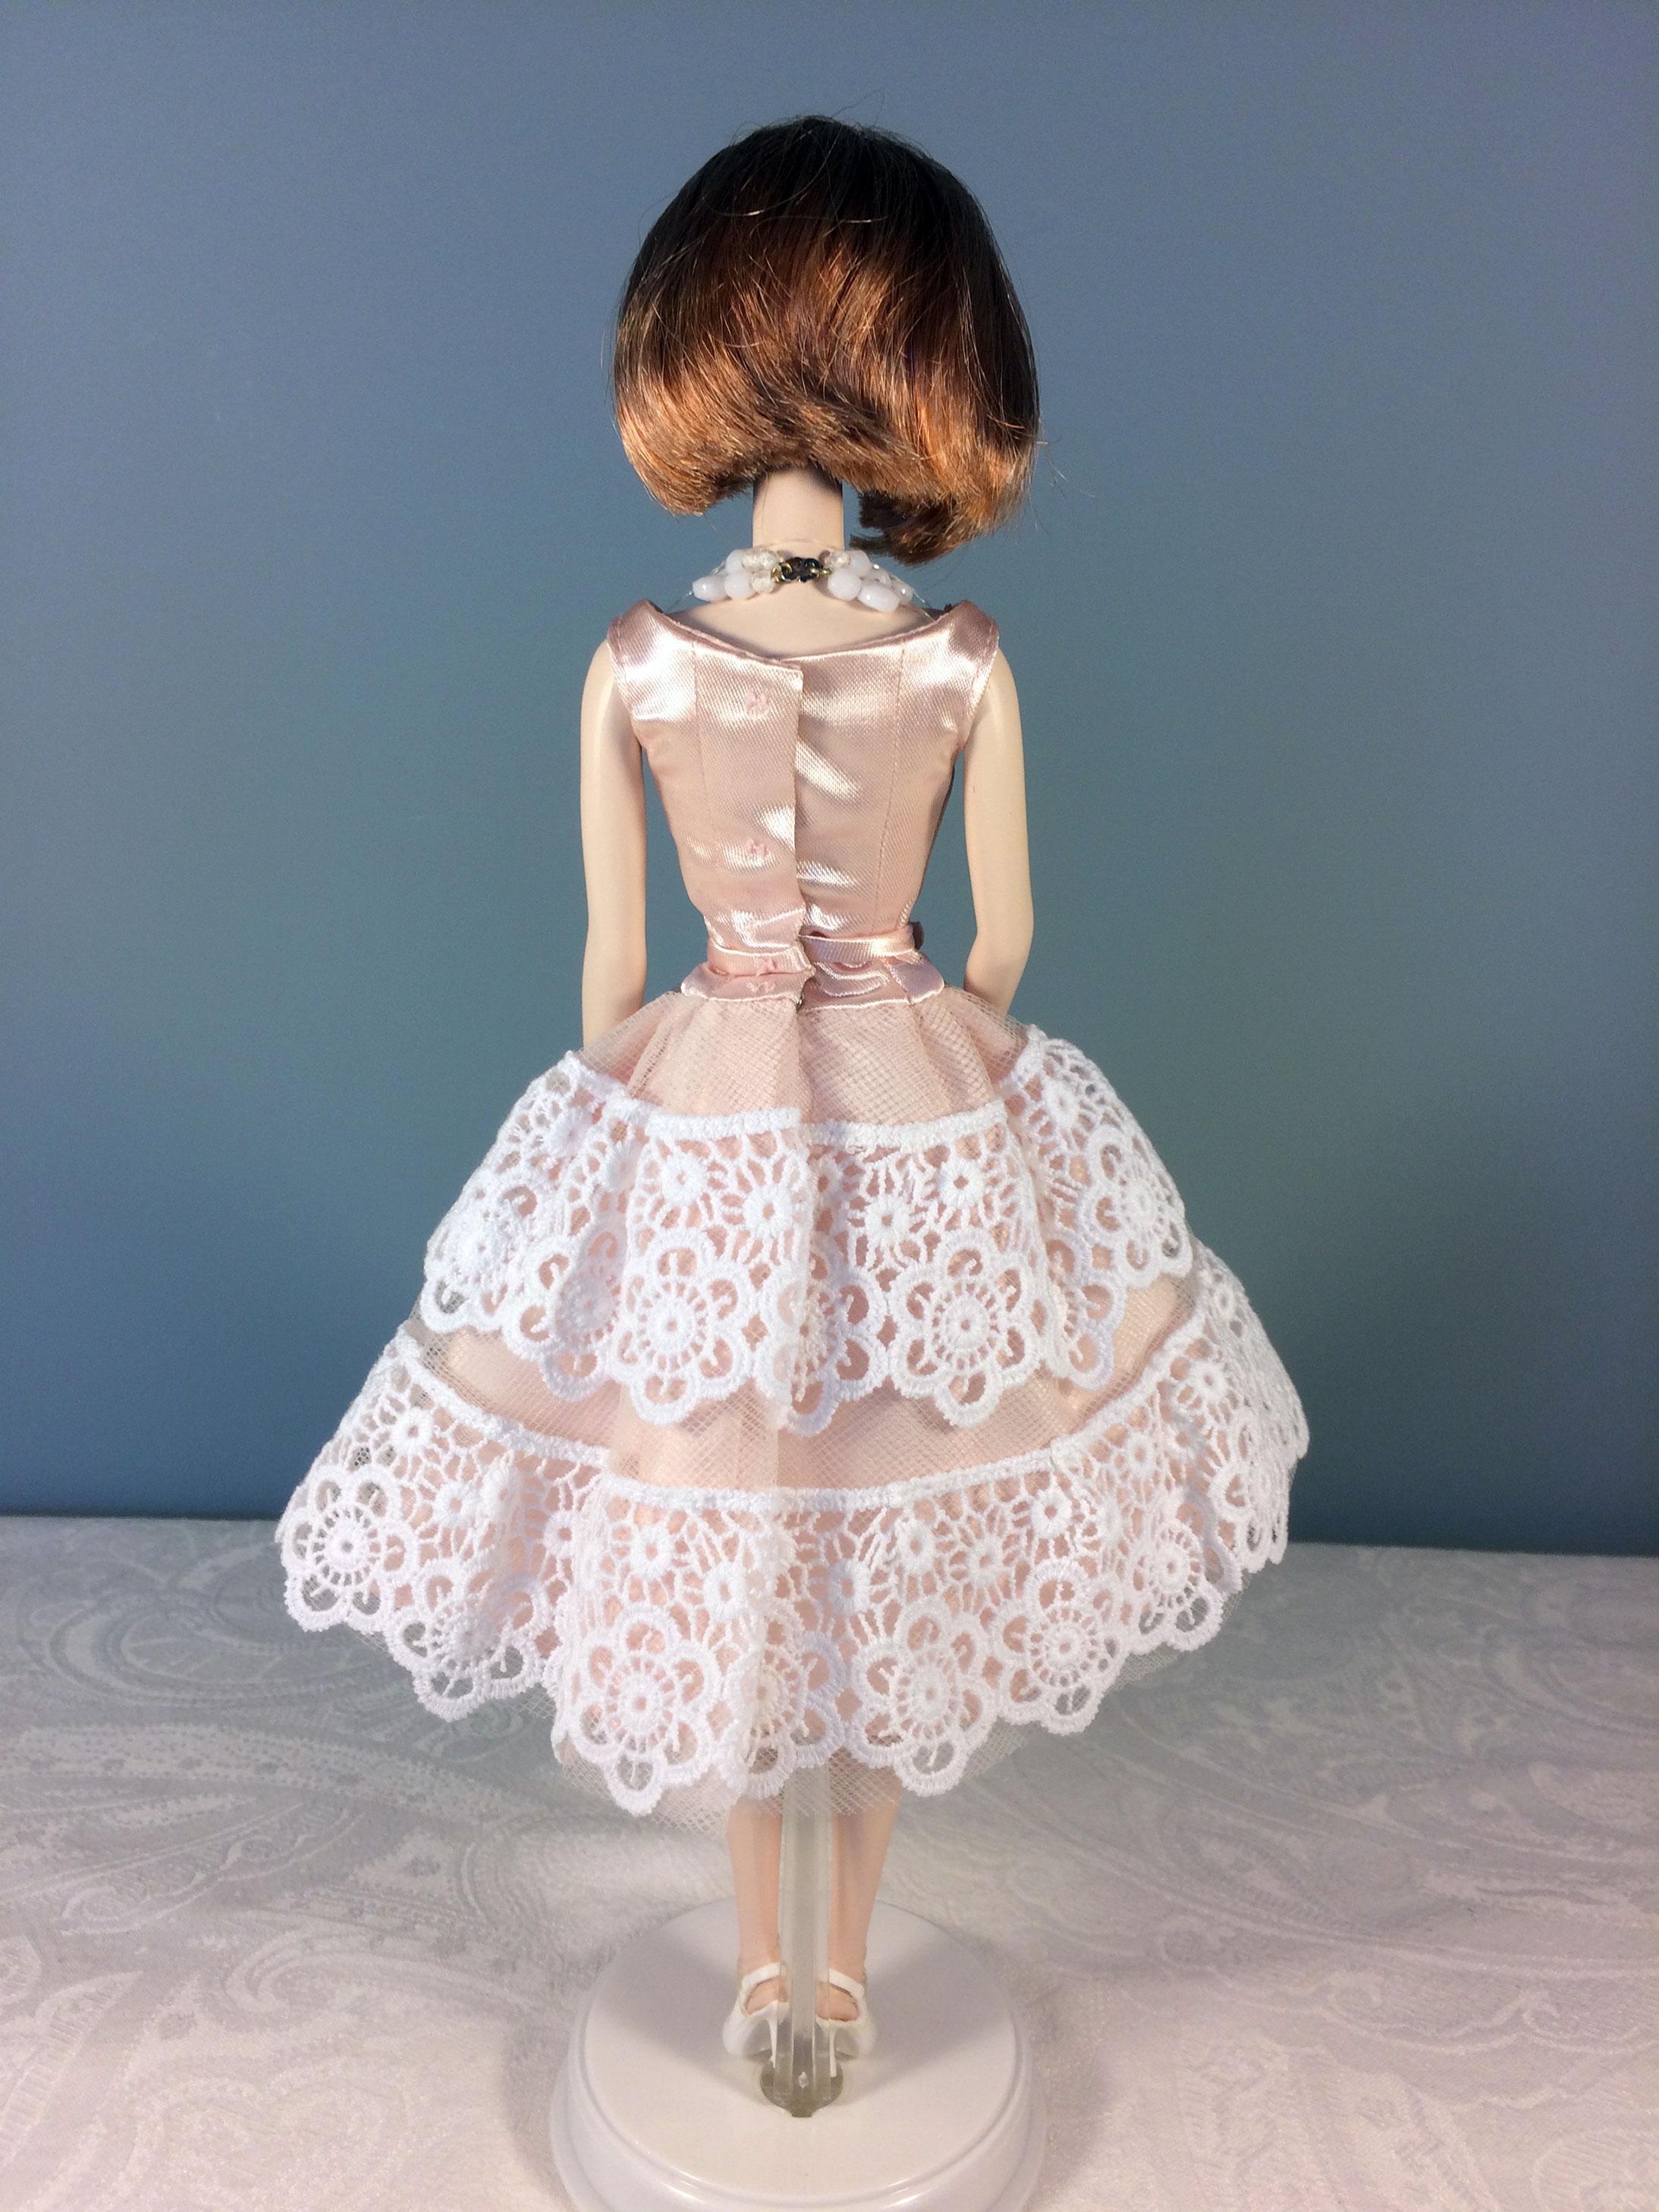 a08cf26ae store b0502 e0009 american girl doll southern belle dress ...